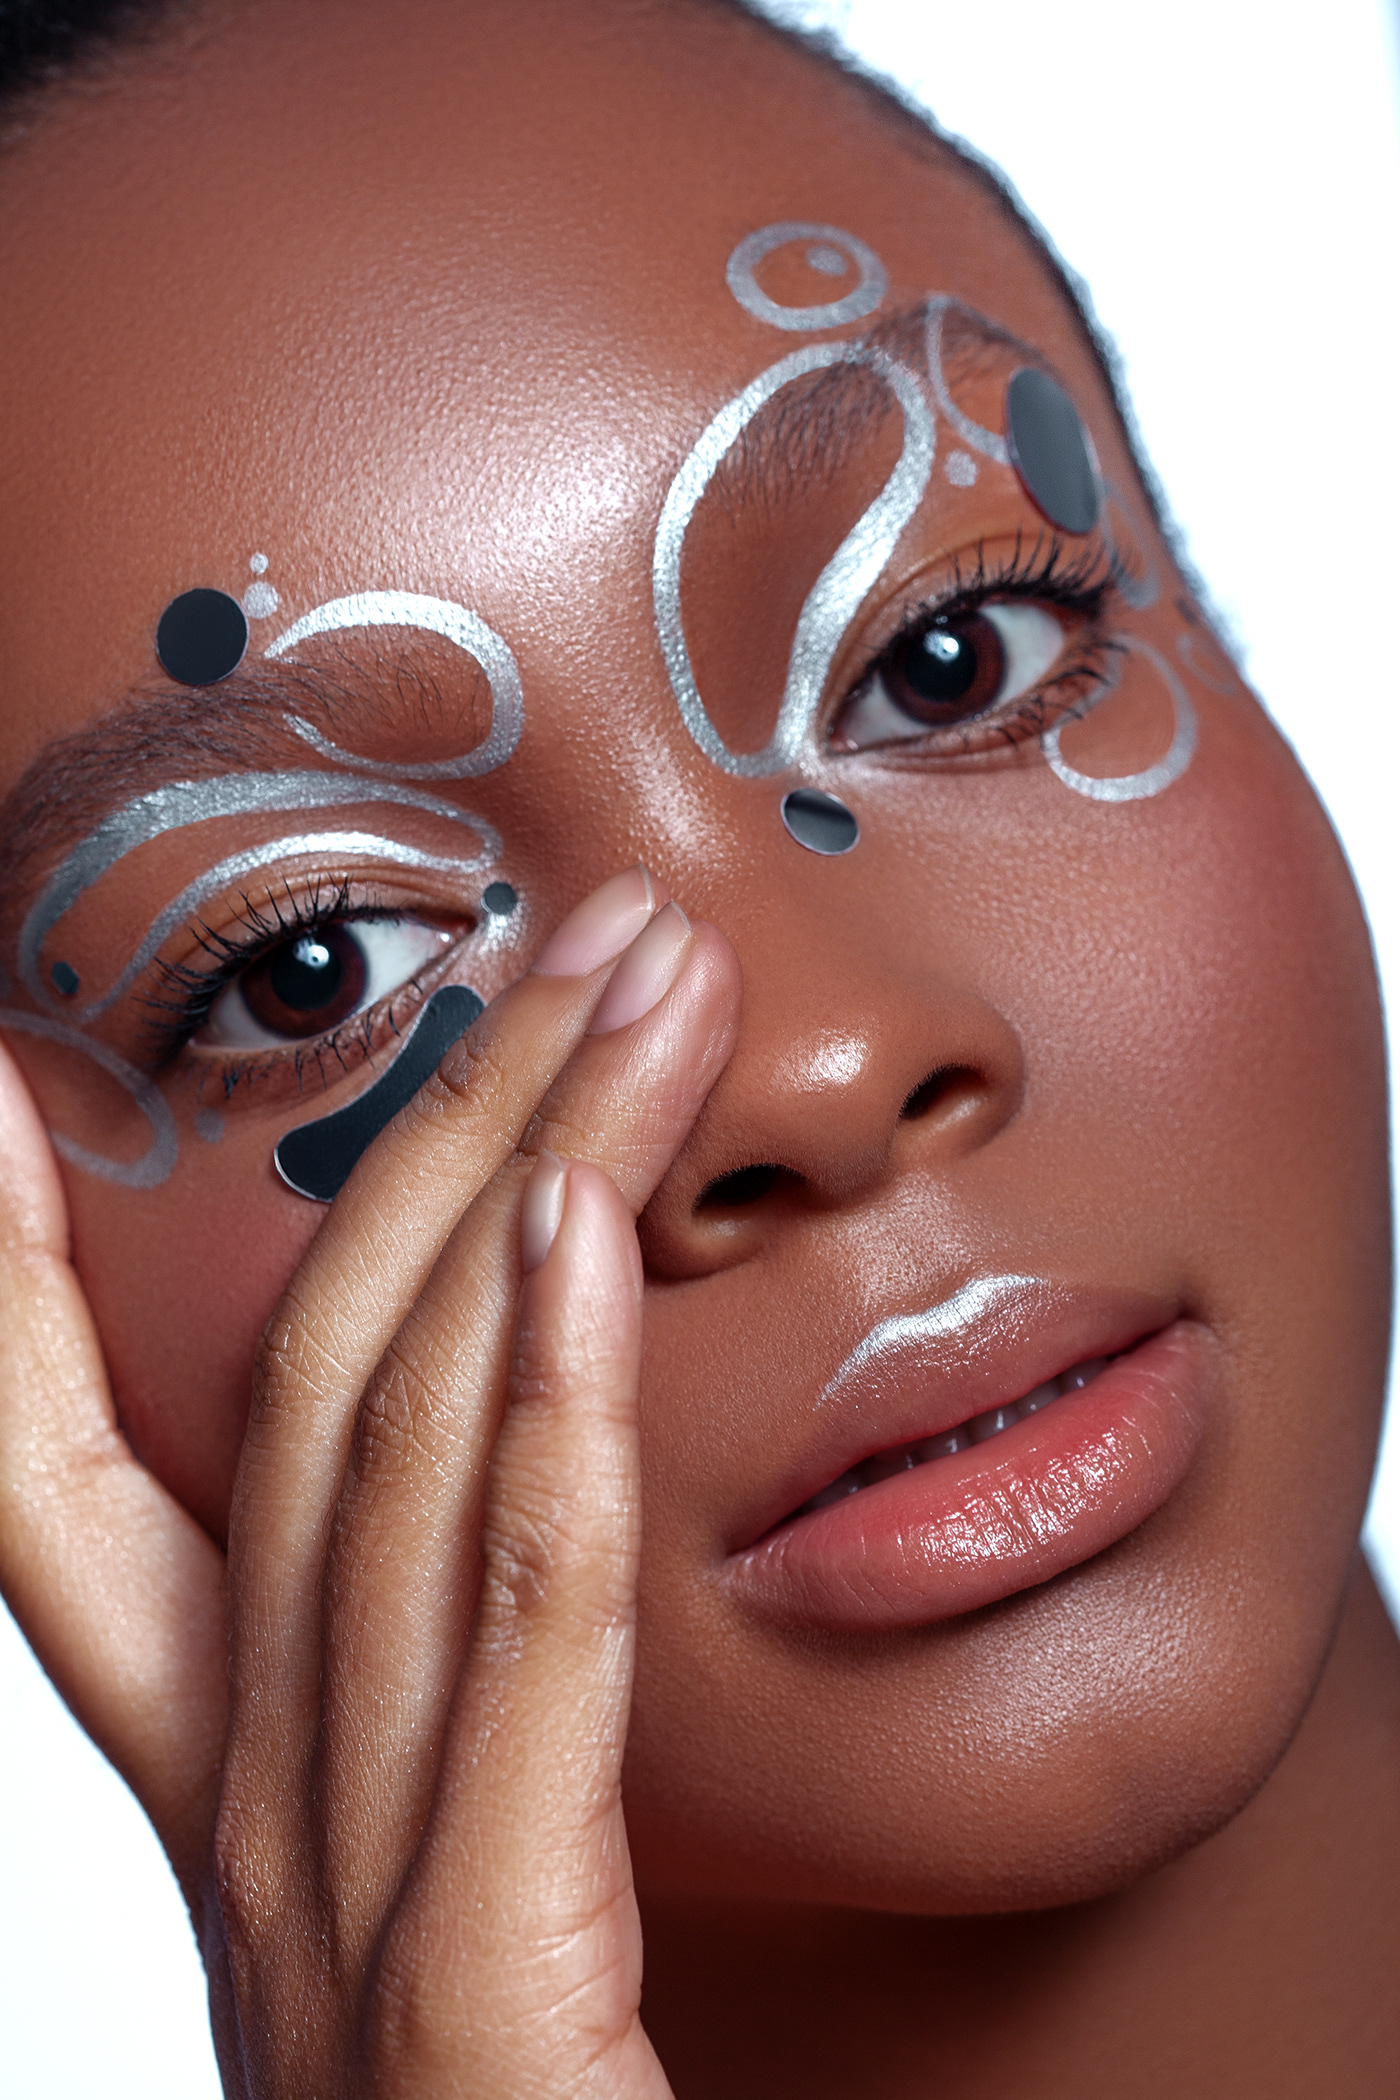 beauty retouch retouching  skin retouch Face art Fashion  hi end Make Up makeup portrait